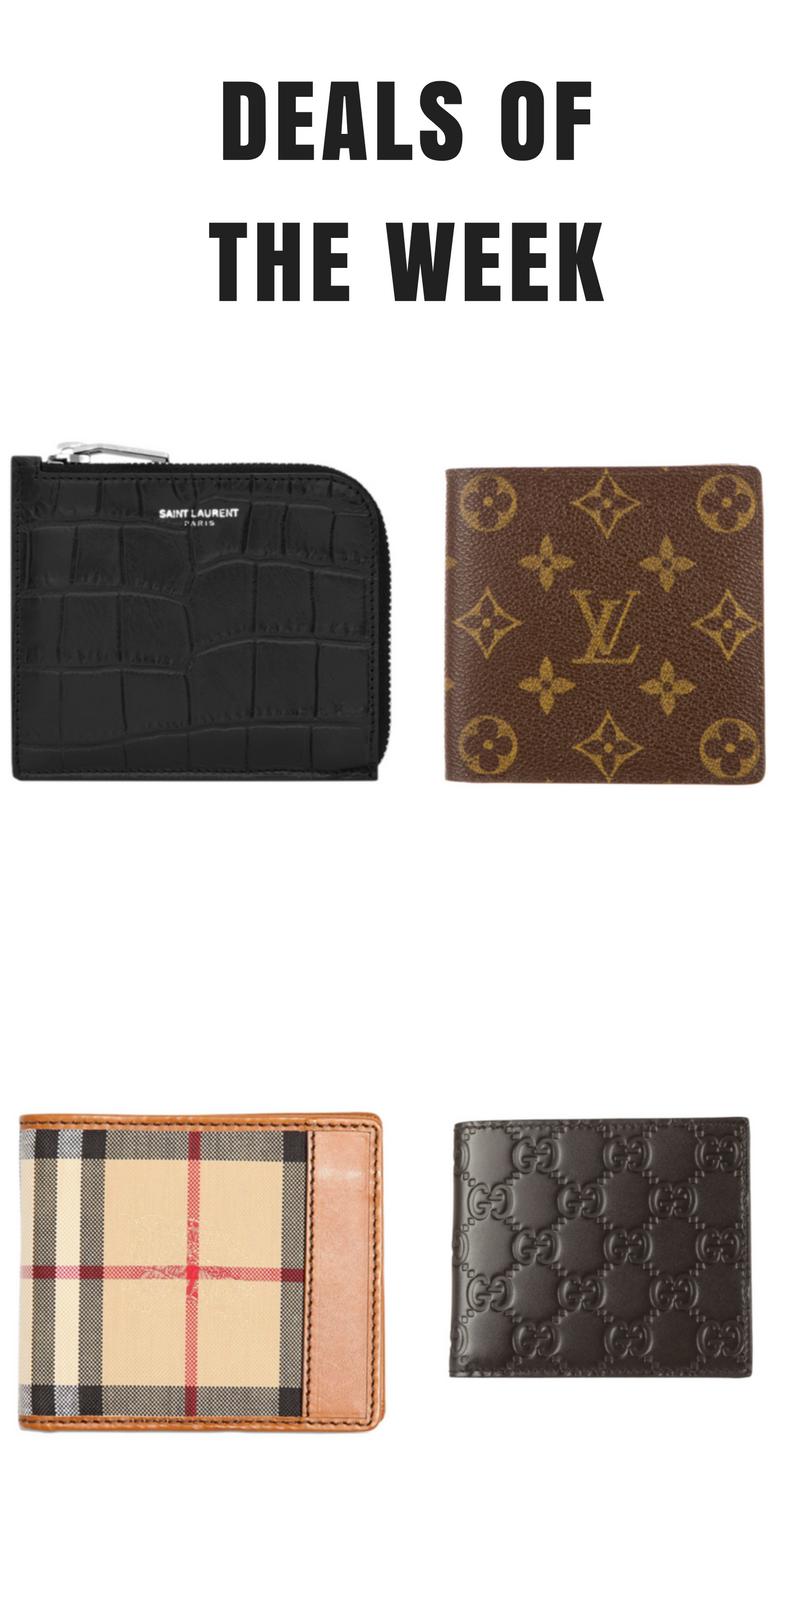 Shop Brand New and Preloved Designer Brands like Louis